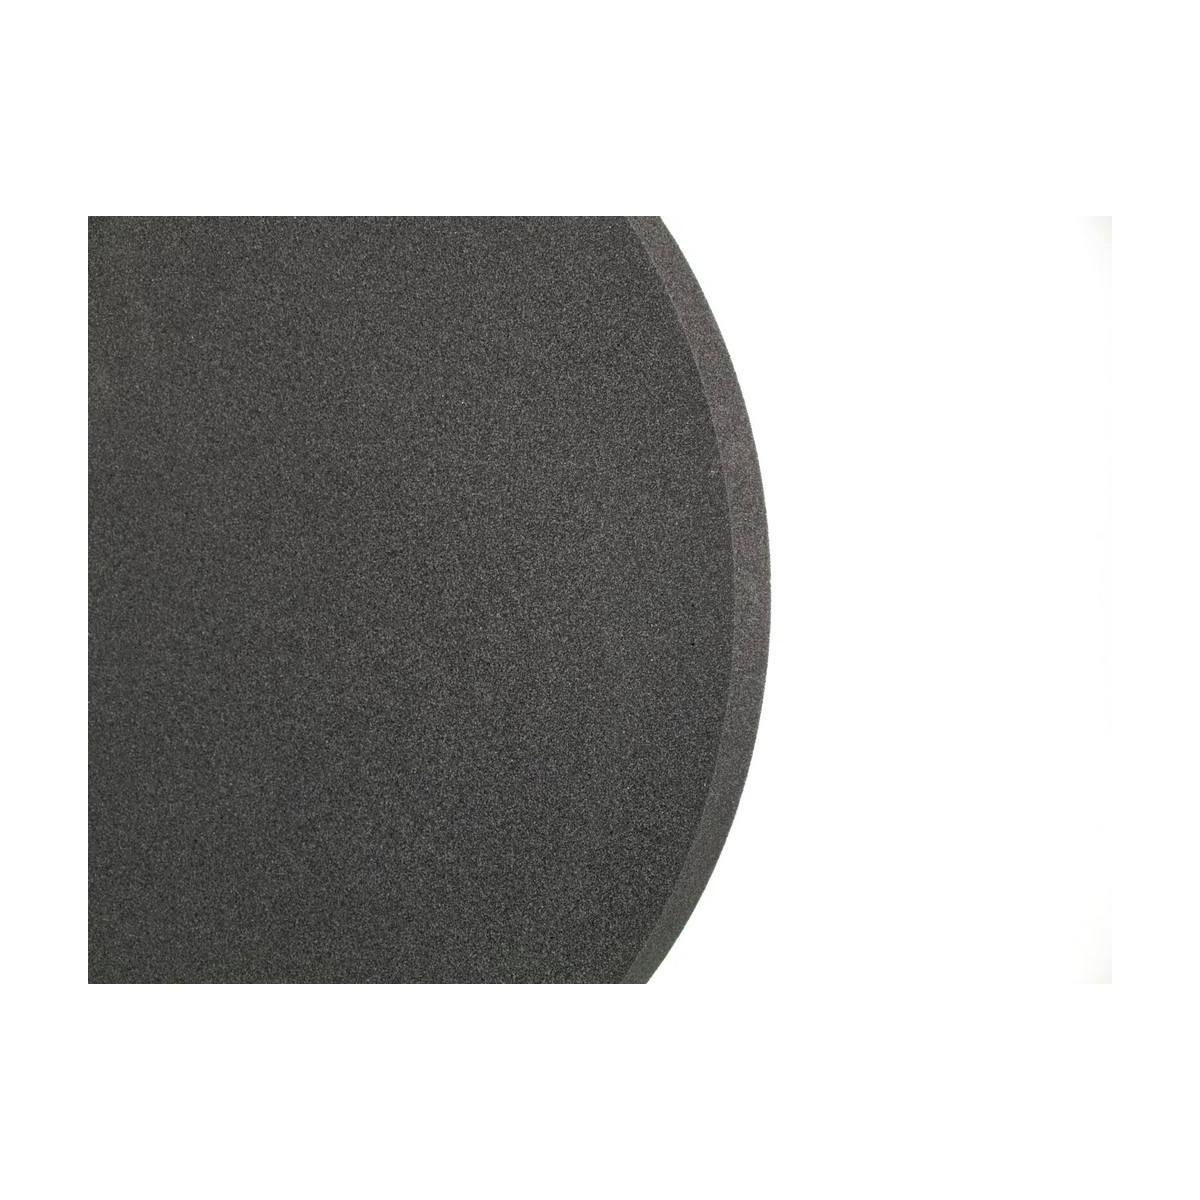 EliAcoustic Circle Pure Dark Grey